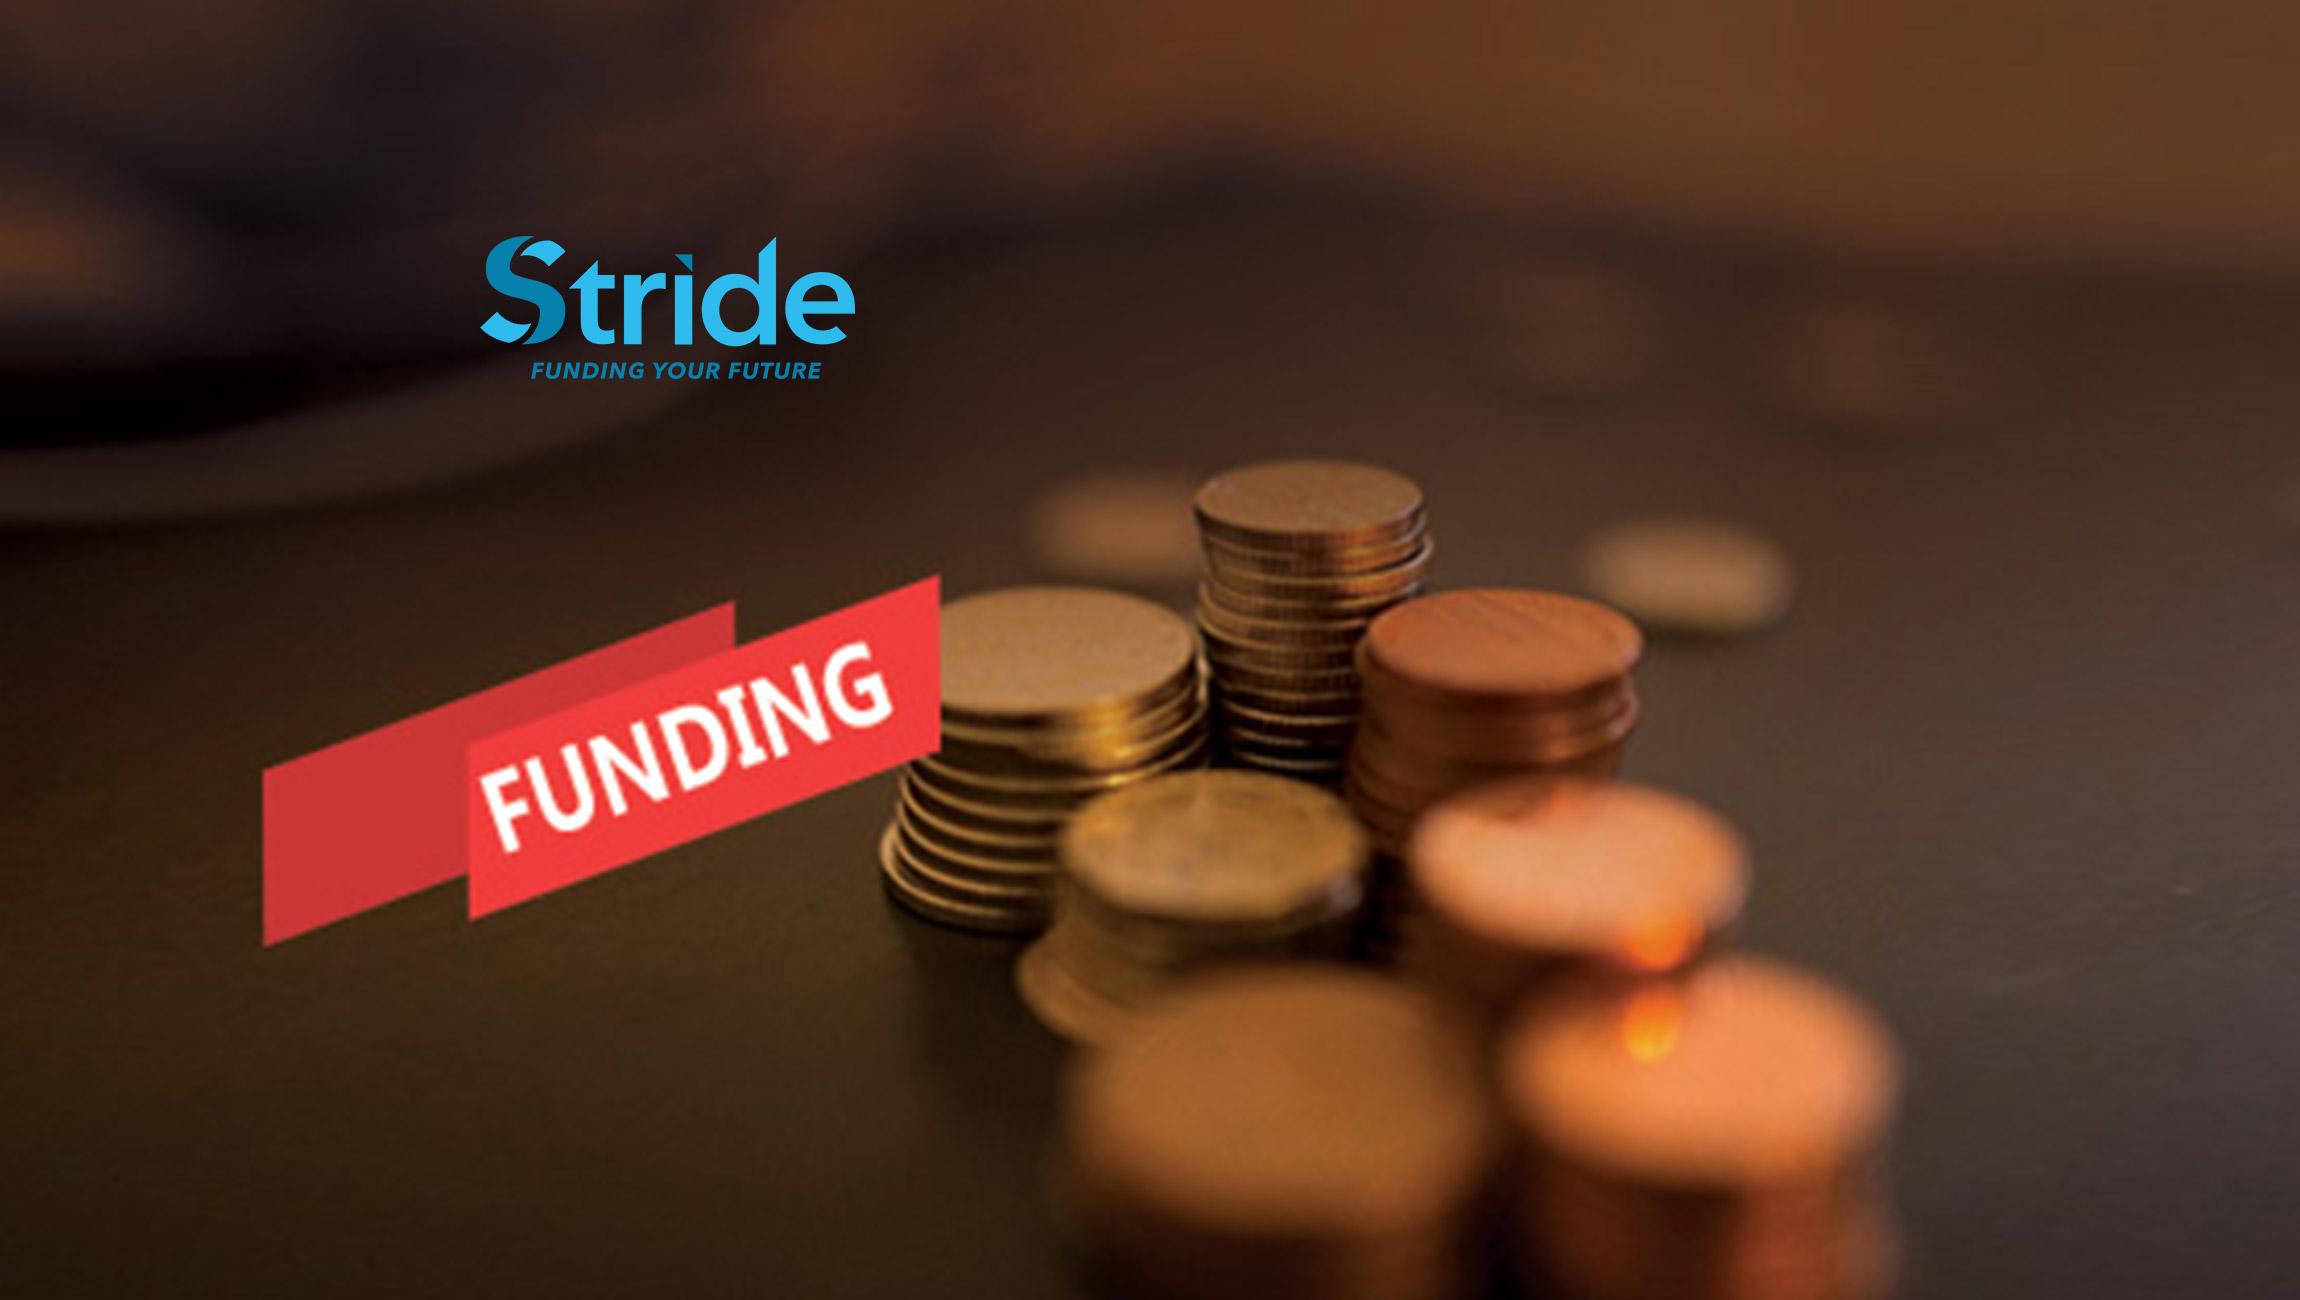 FinTech Disruptor Stride Funding Secures Venture Funding